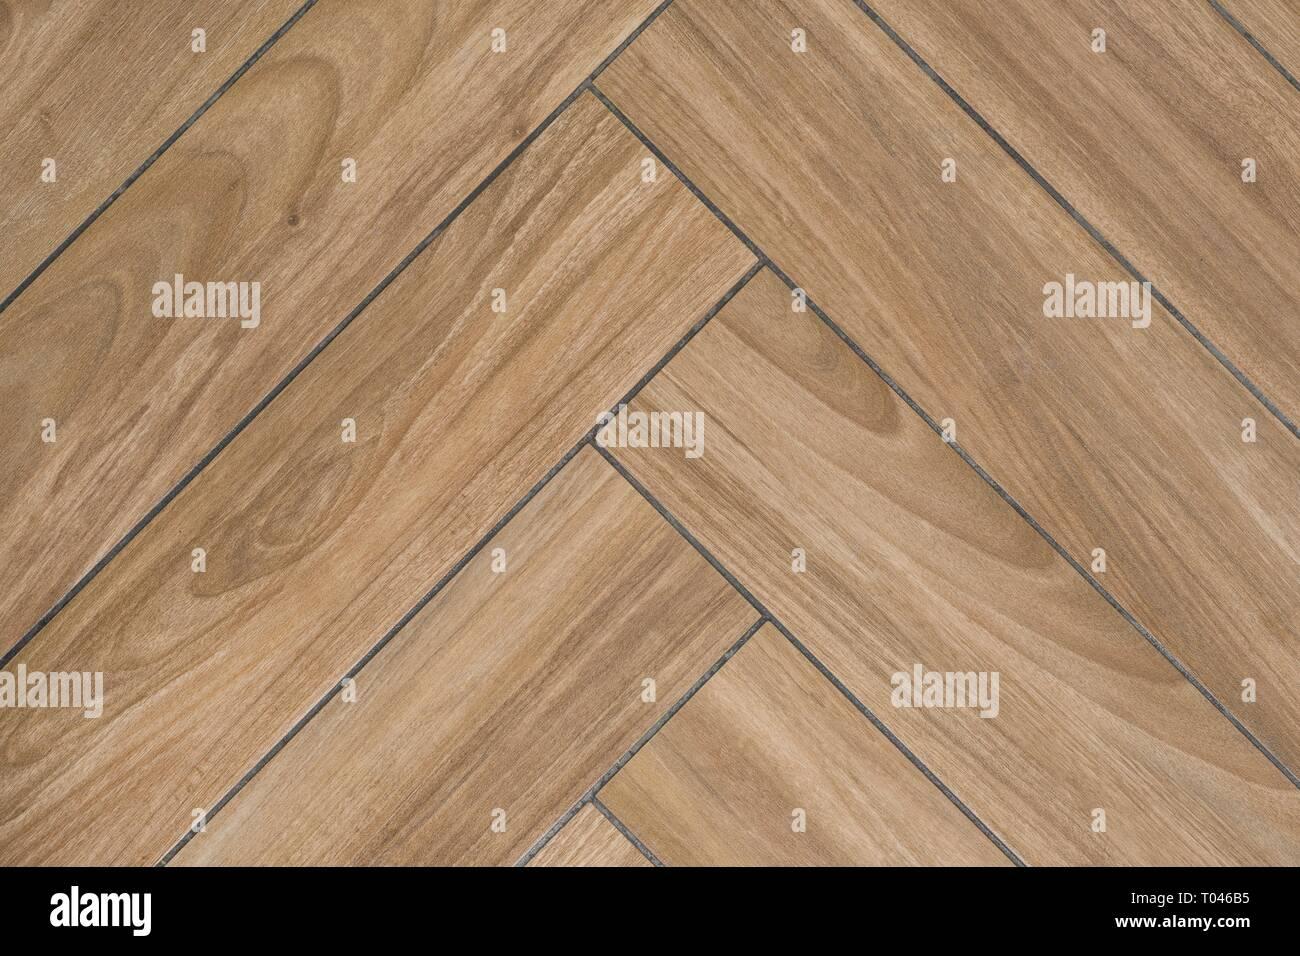 https www alamy com oak wood texture of floor with tiles immitating hardwood flooring traditional herringbone pattern image241037977 html